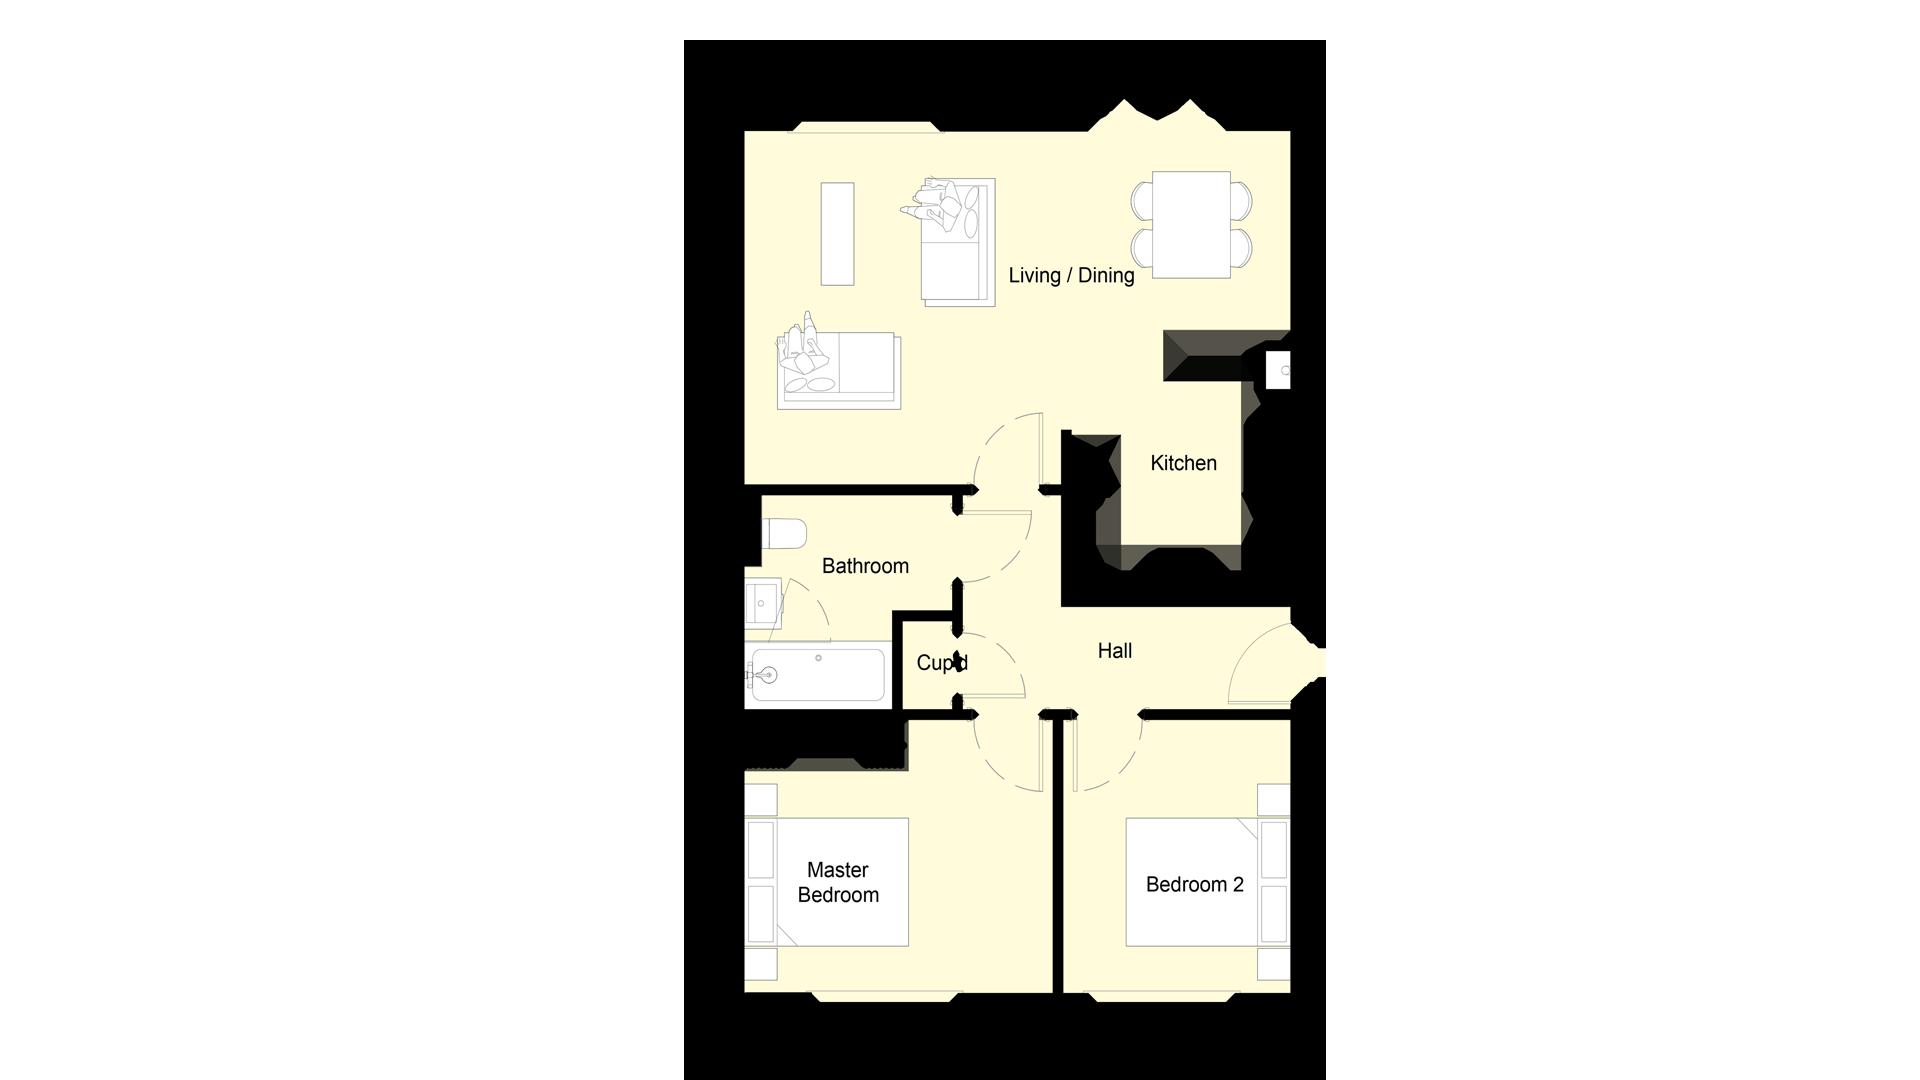 Layout of ground floor Plot 2 Phase 2 Churchfields.